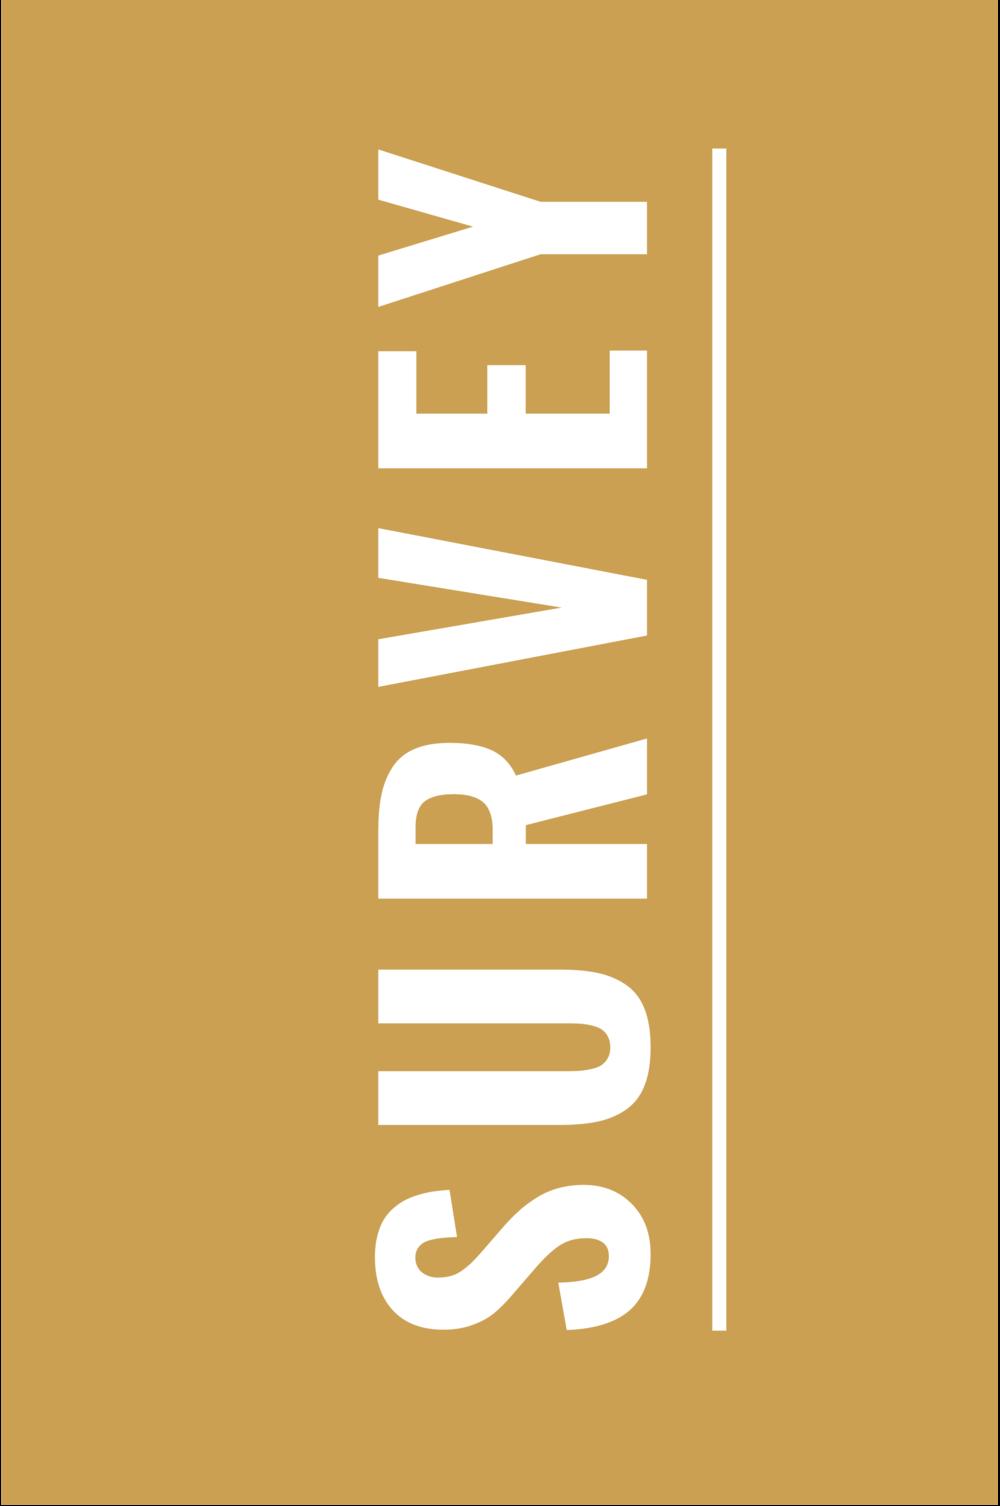 Survey_Box-01.png